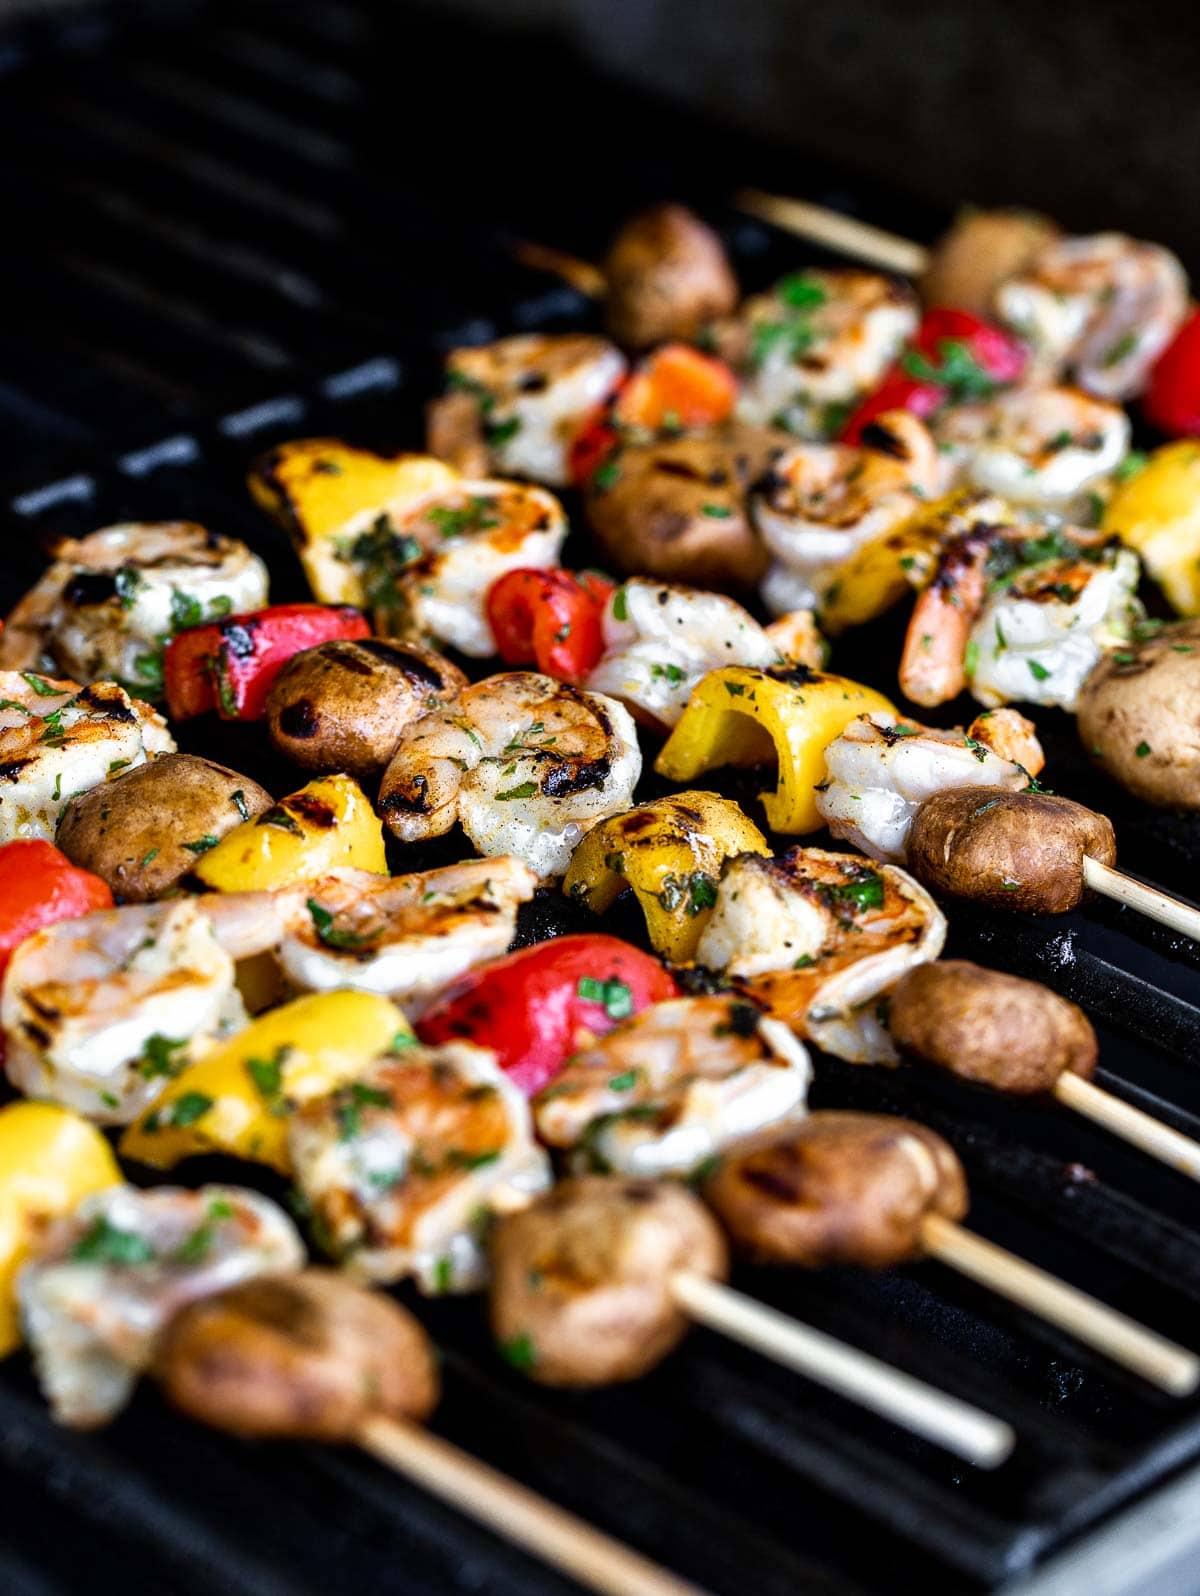 Shrimp Veggie Kabobs on the grill